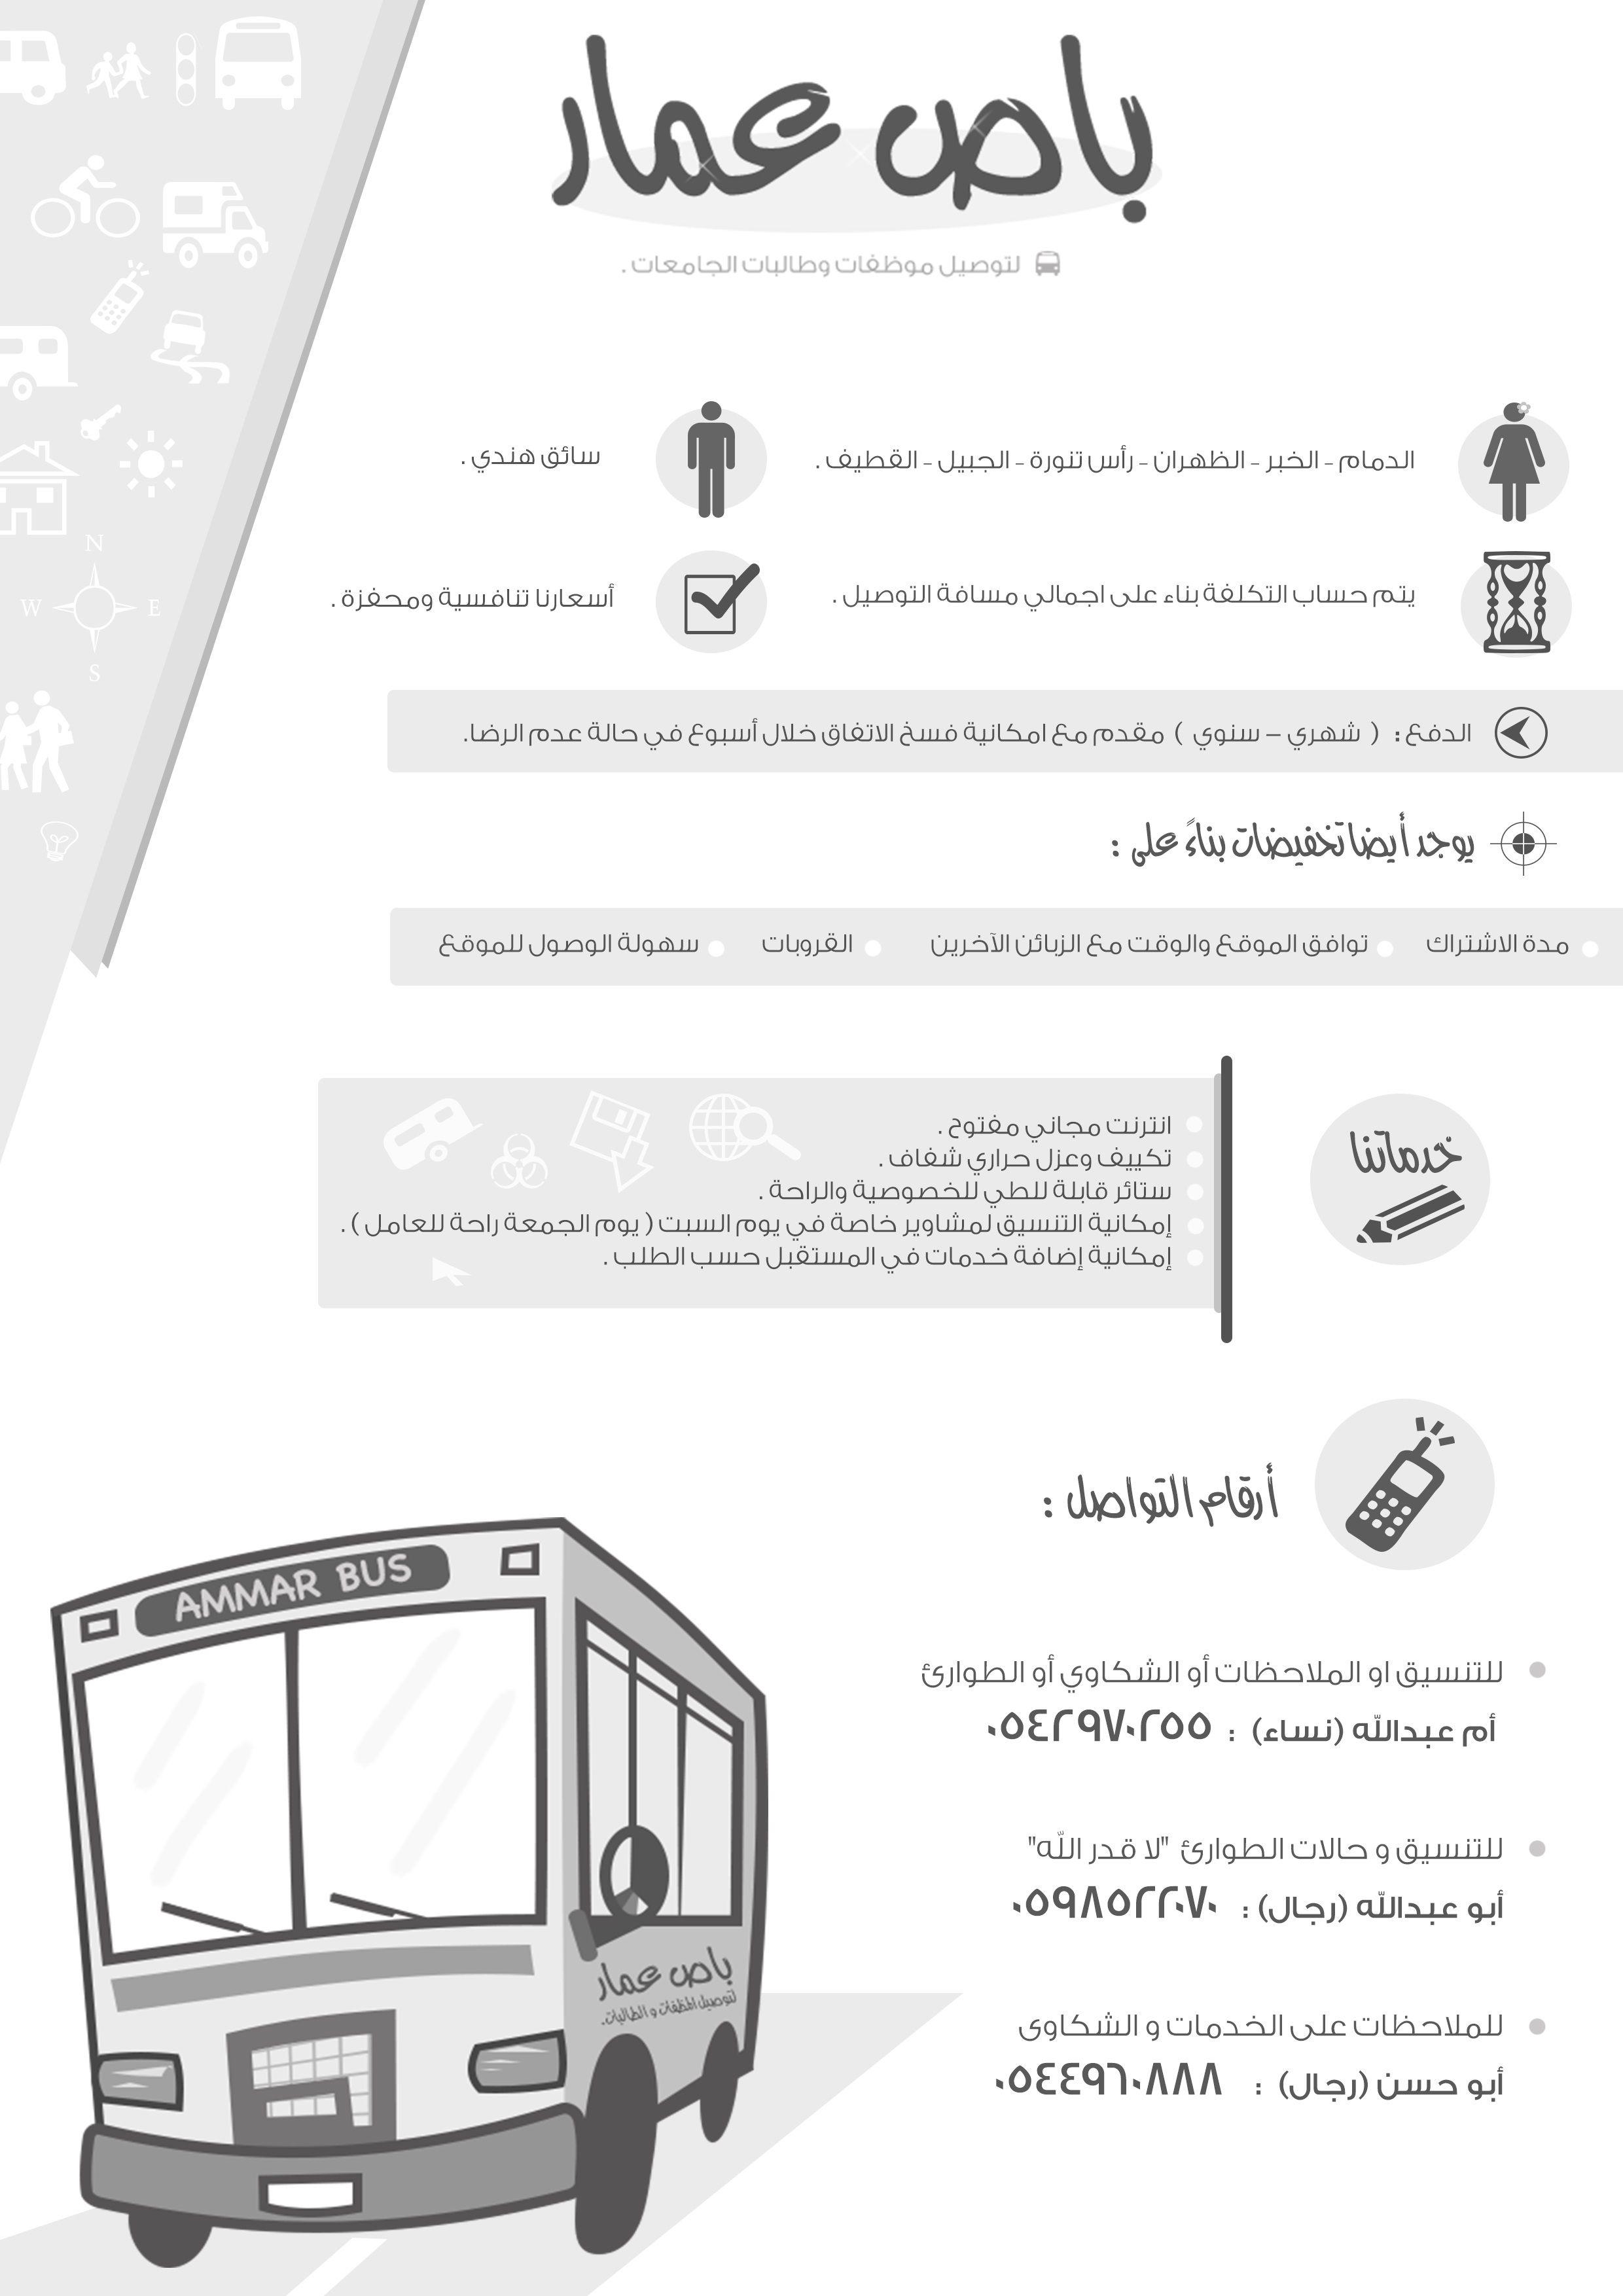 4cca74ac31a02 معلومات عن الاإعلان   توصيل معلمات وموظفات وطالبات في  الدمام-الخبر-الظهران-رأس